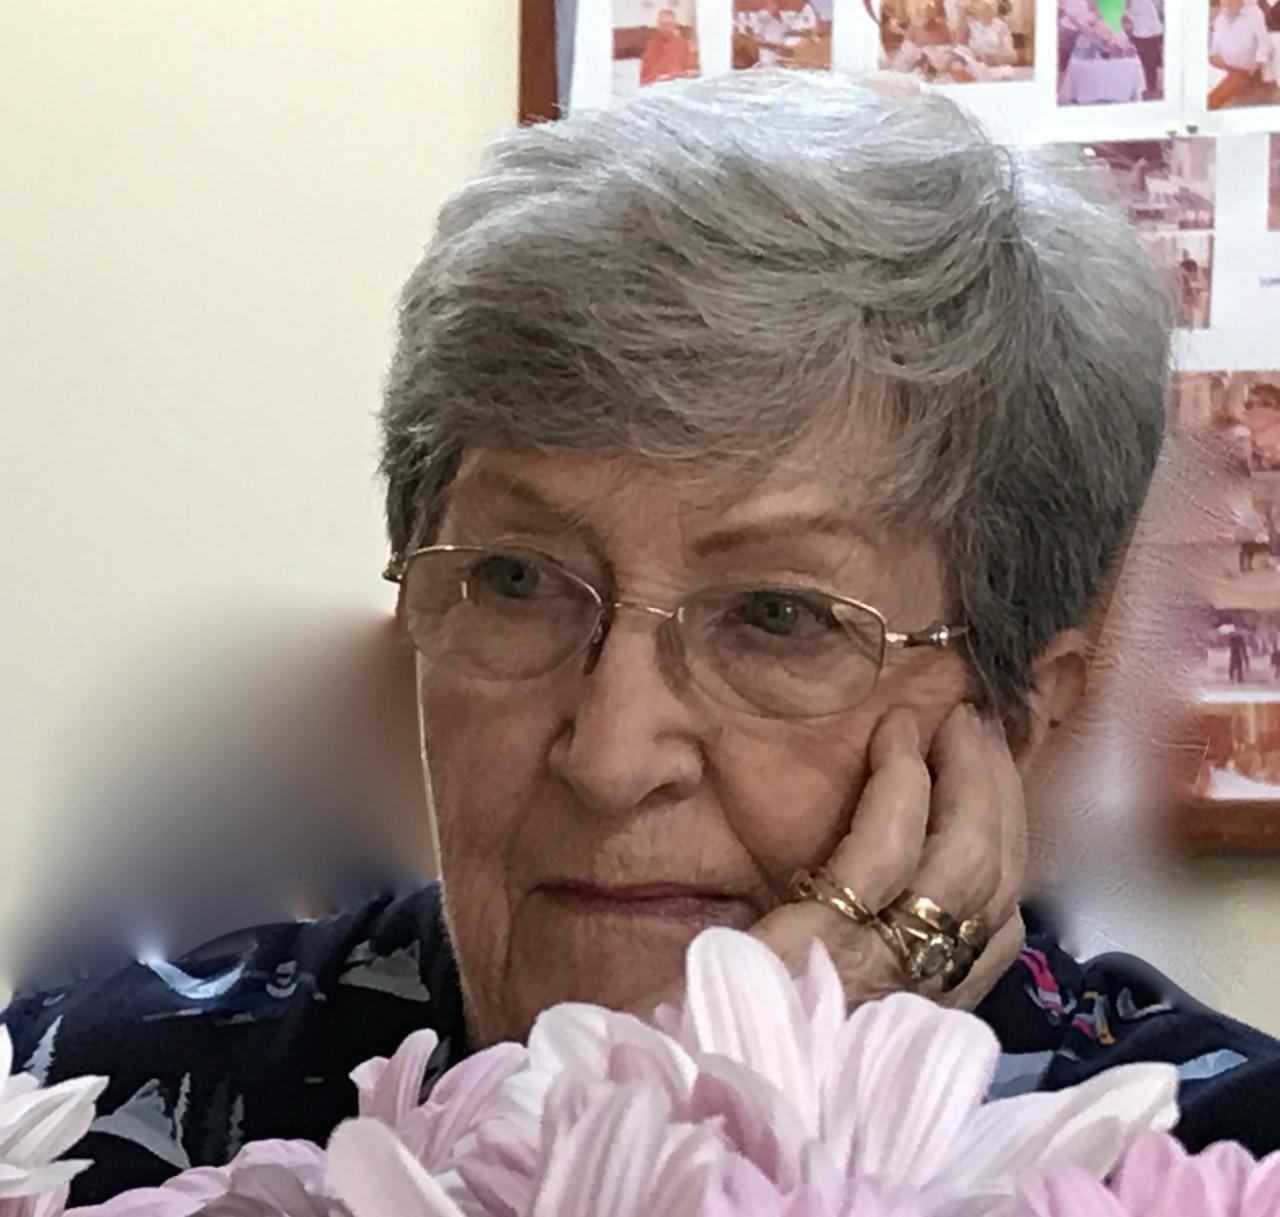 Meryl Harrison on her 80th birthday